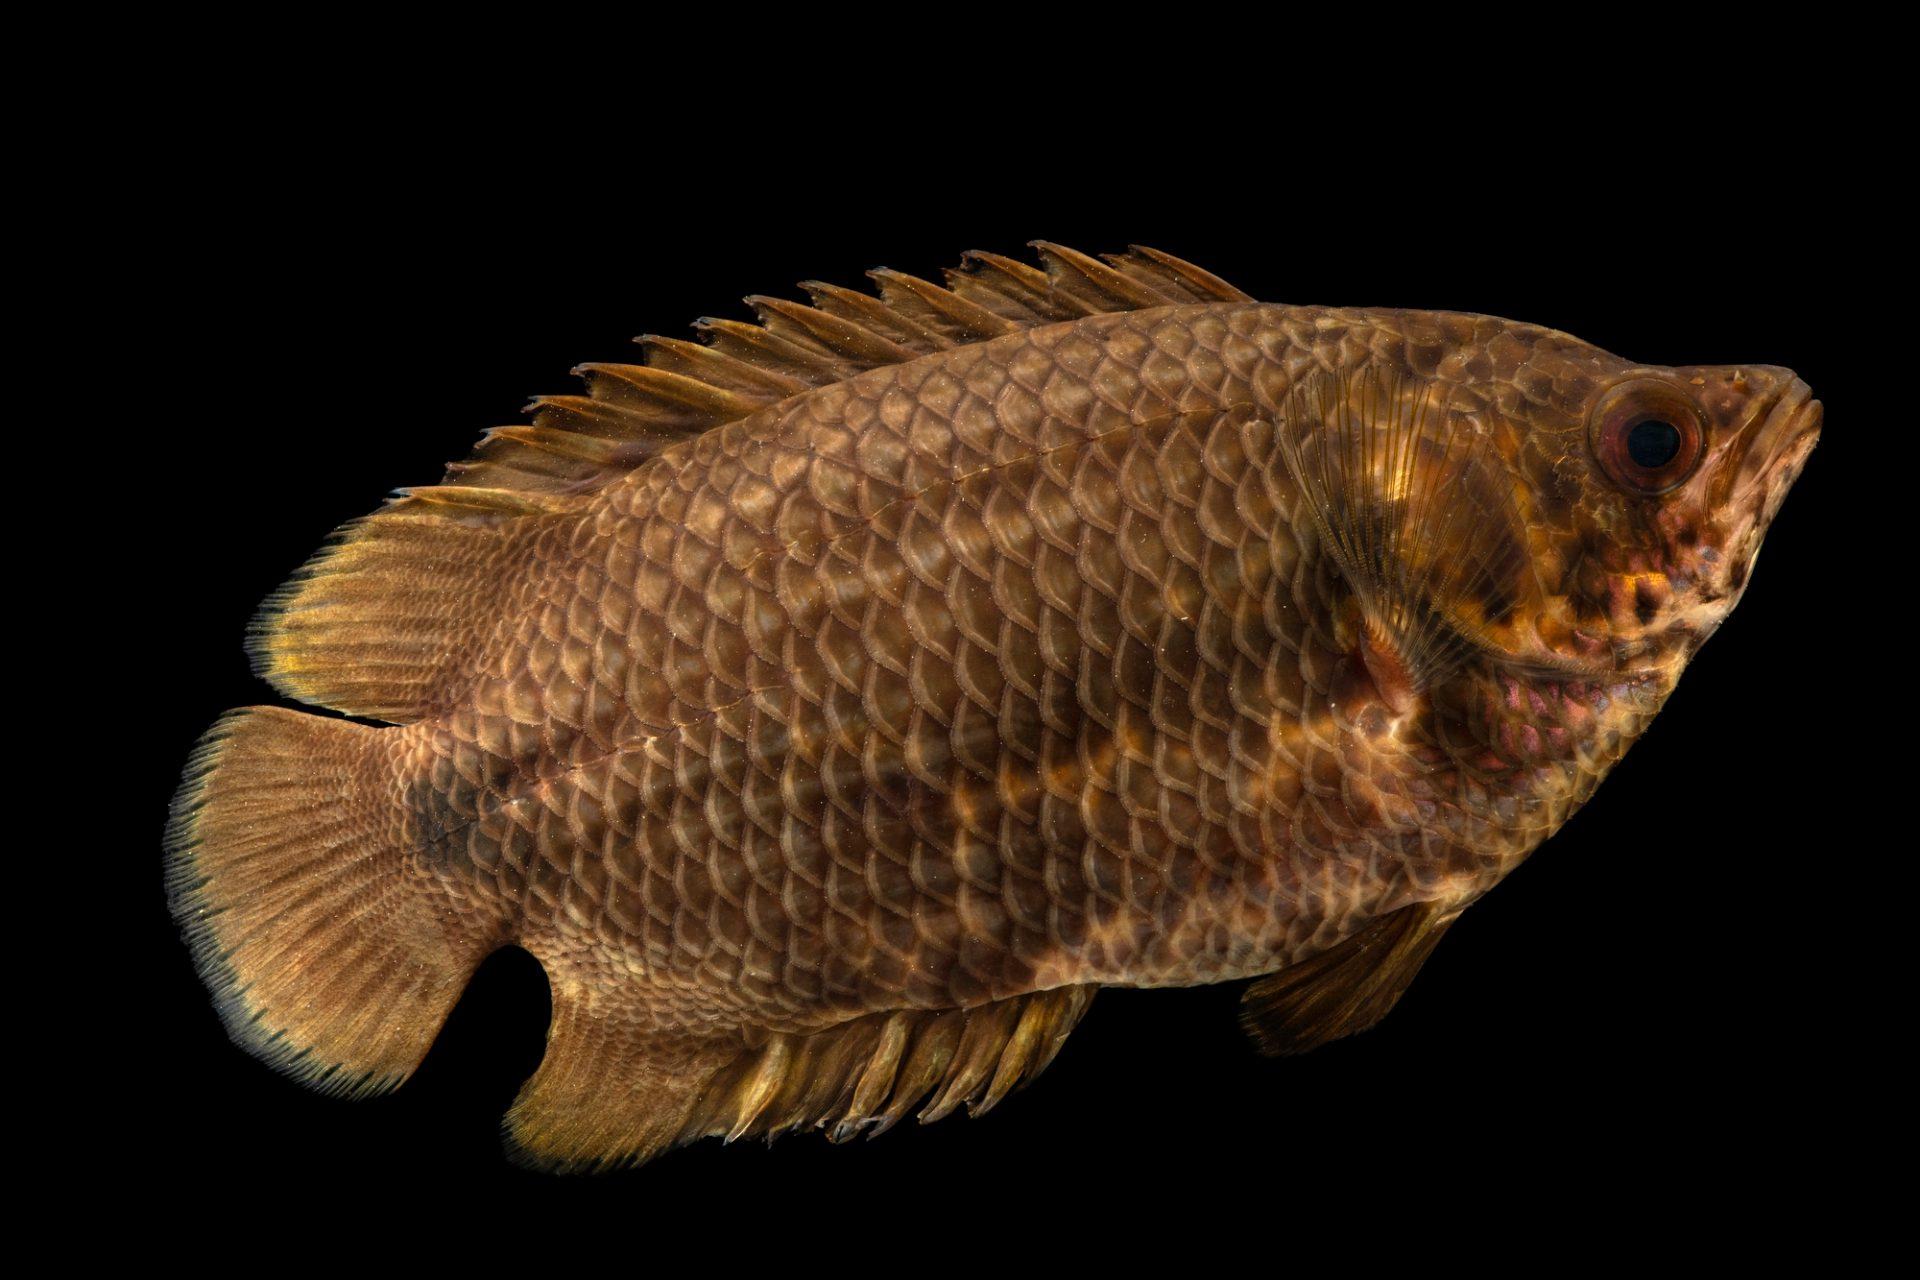 Photo: A leopard bush fish (Ctenopoma acutirostre) at the Fish Biodiversity Lab at Auburn University.